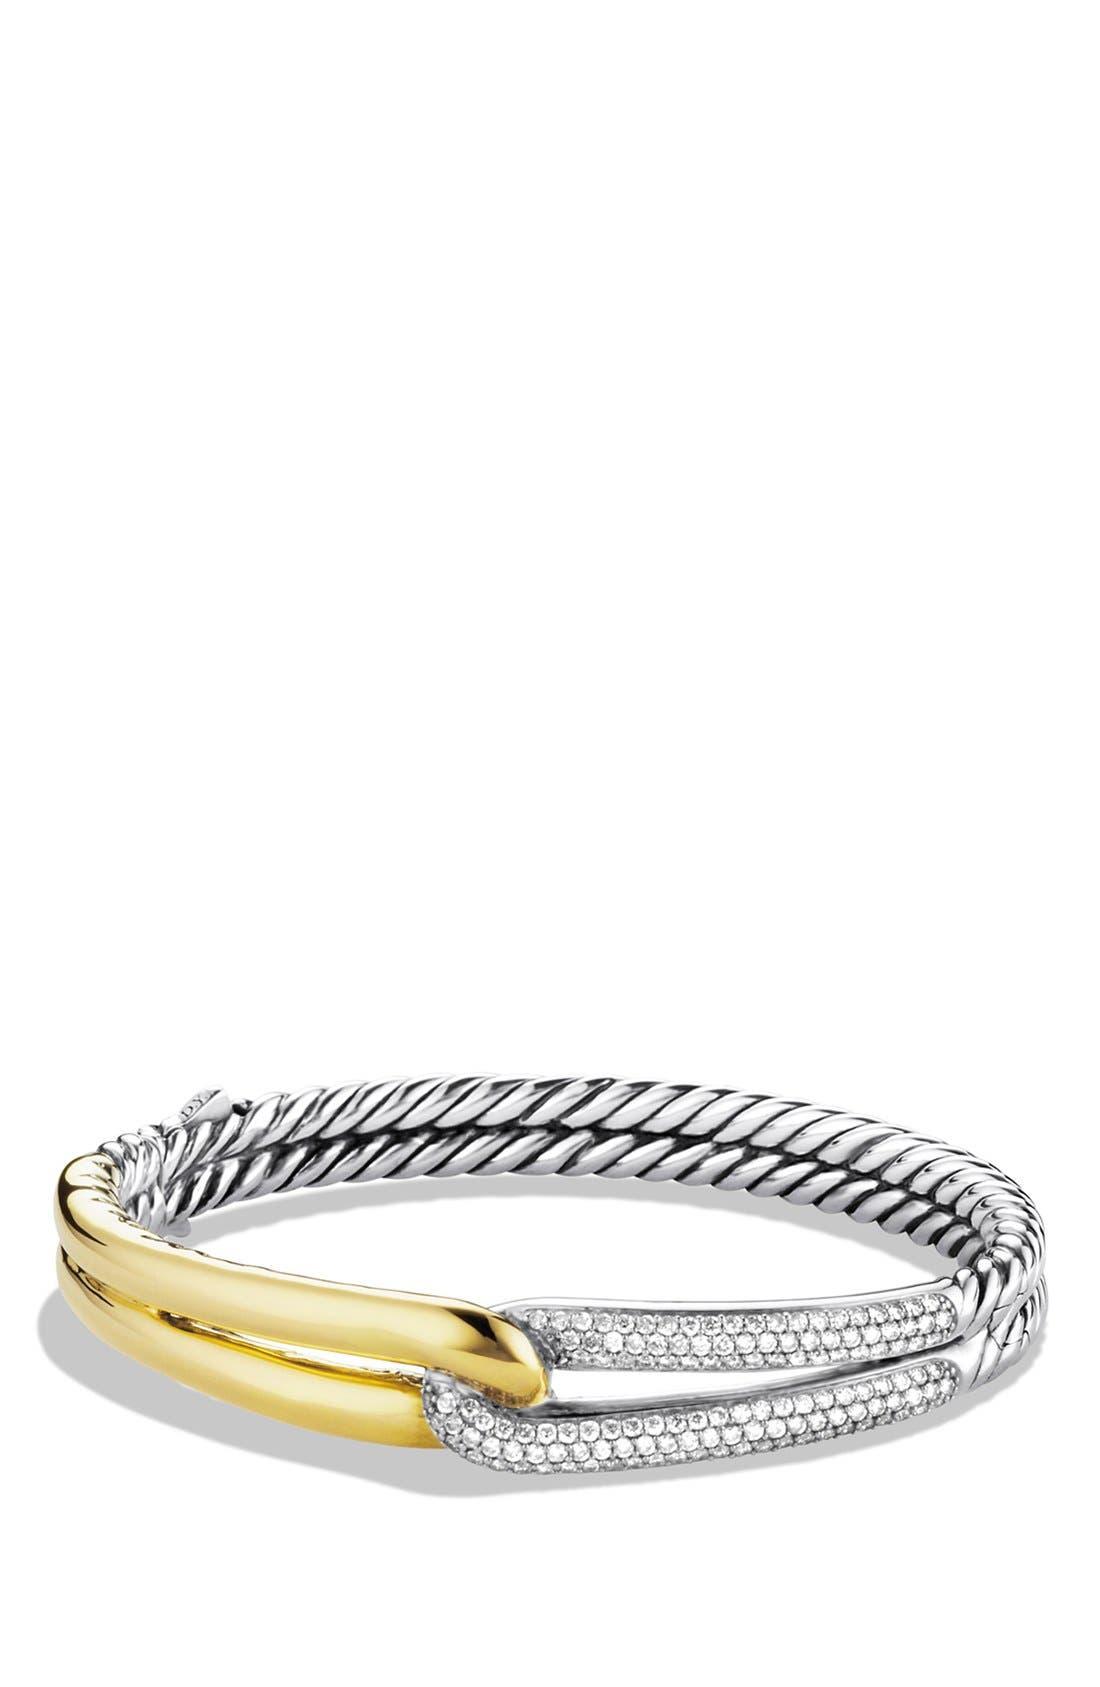 Main Image - David Yurman 'Labyrinth' Single Loop Bracelet with Diamonds